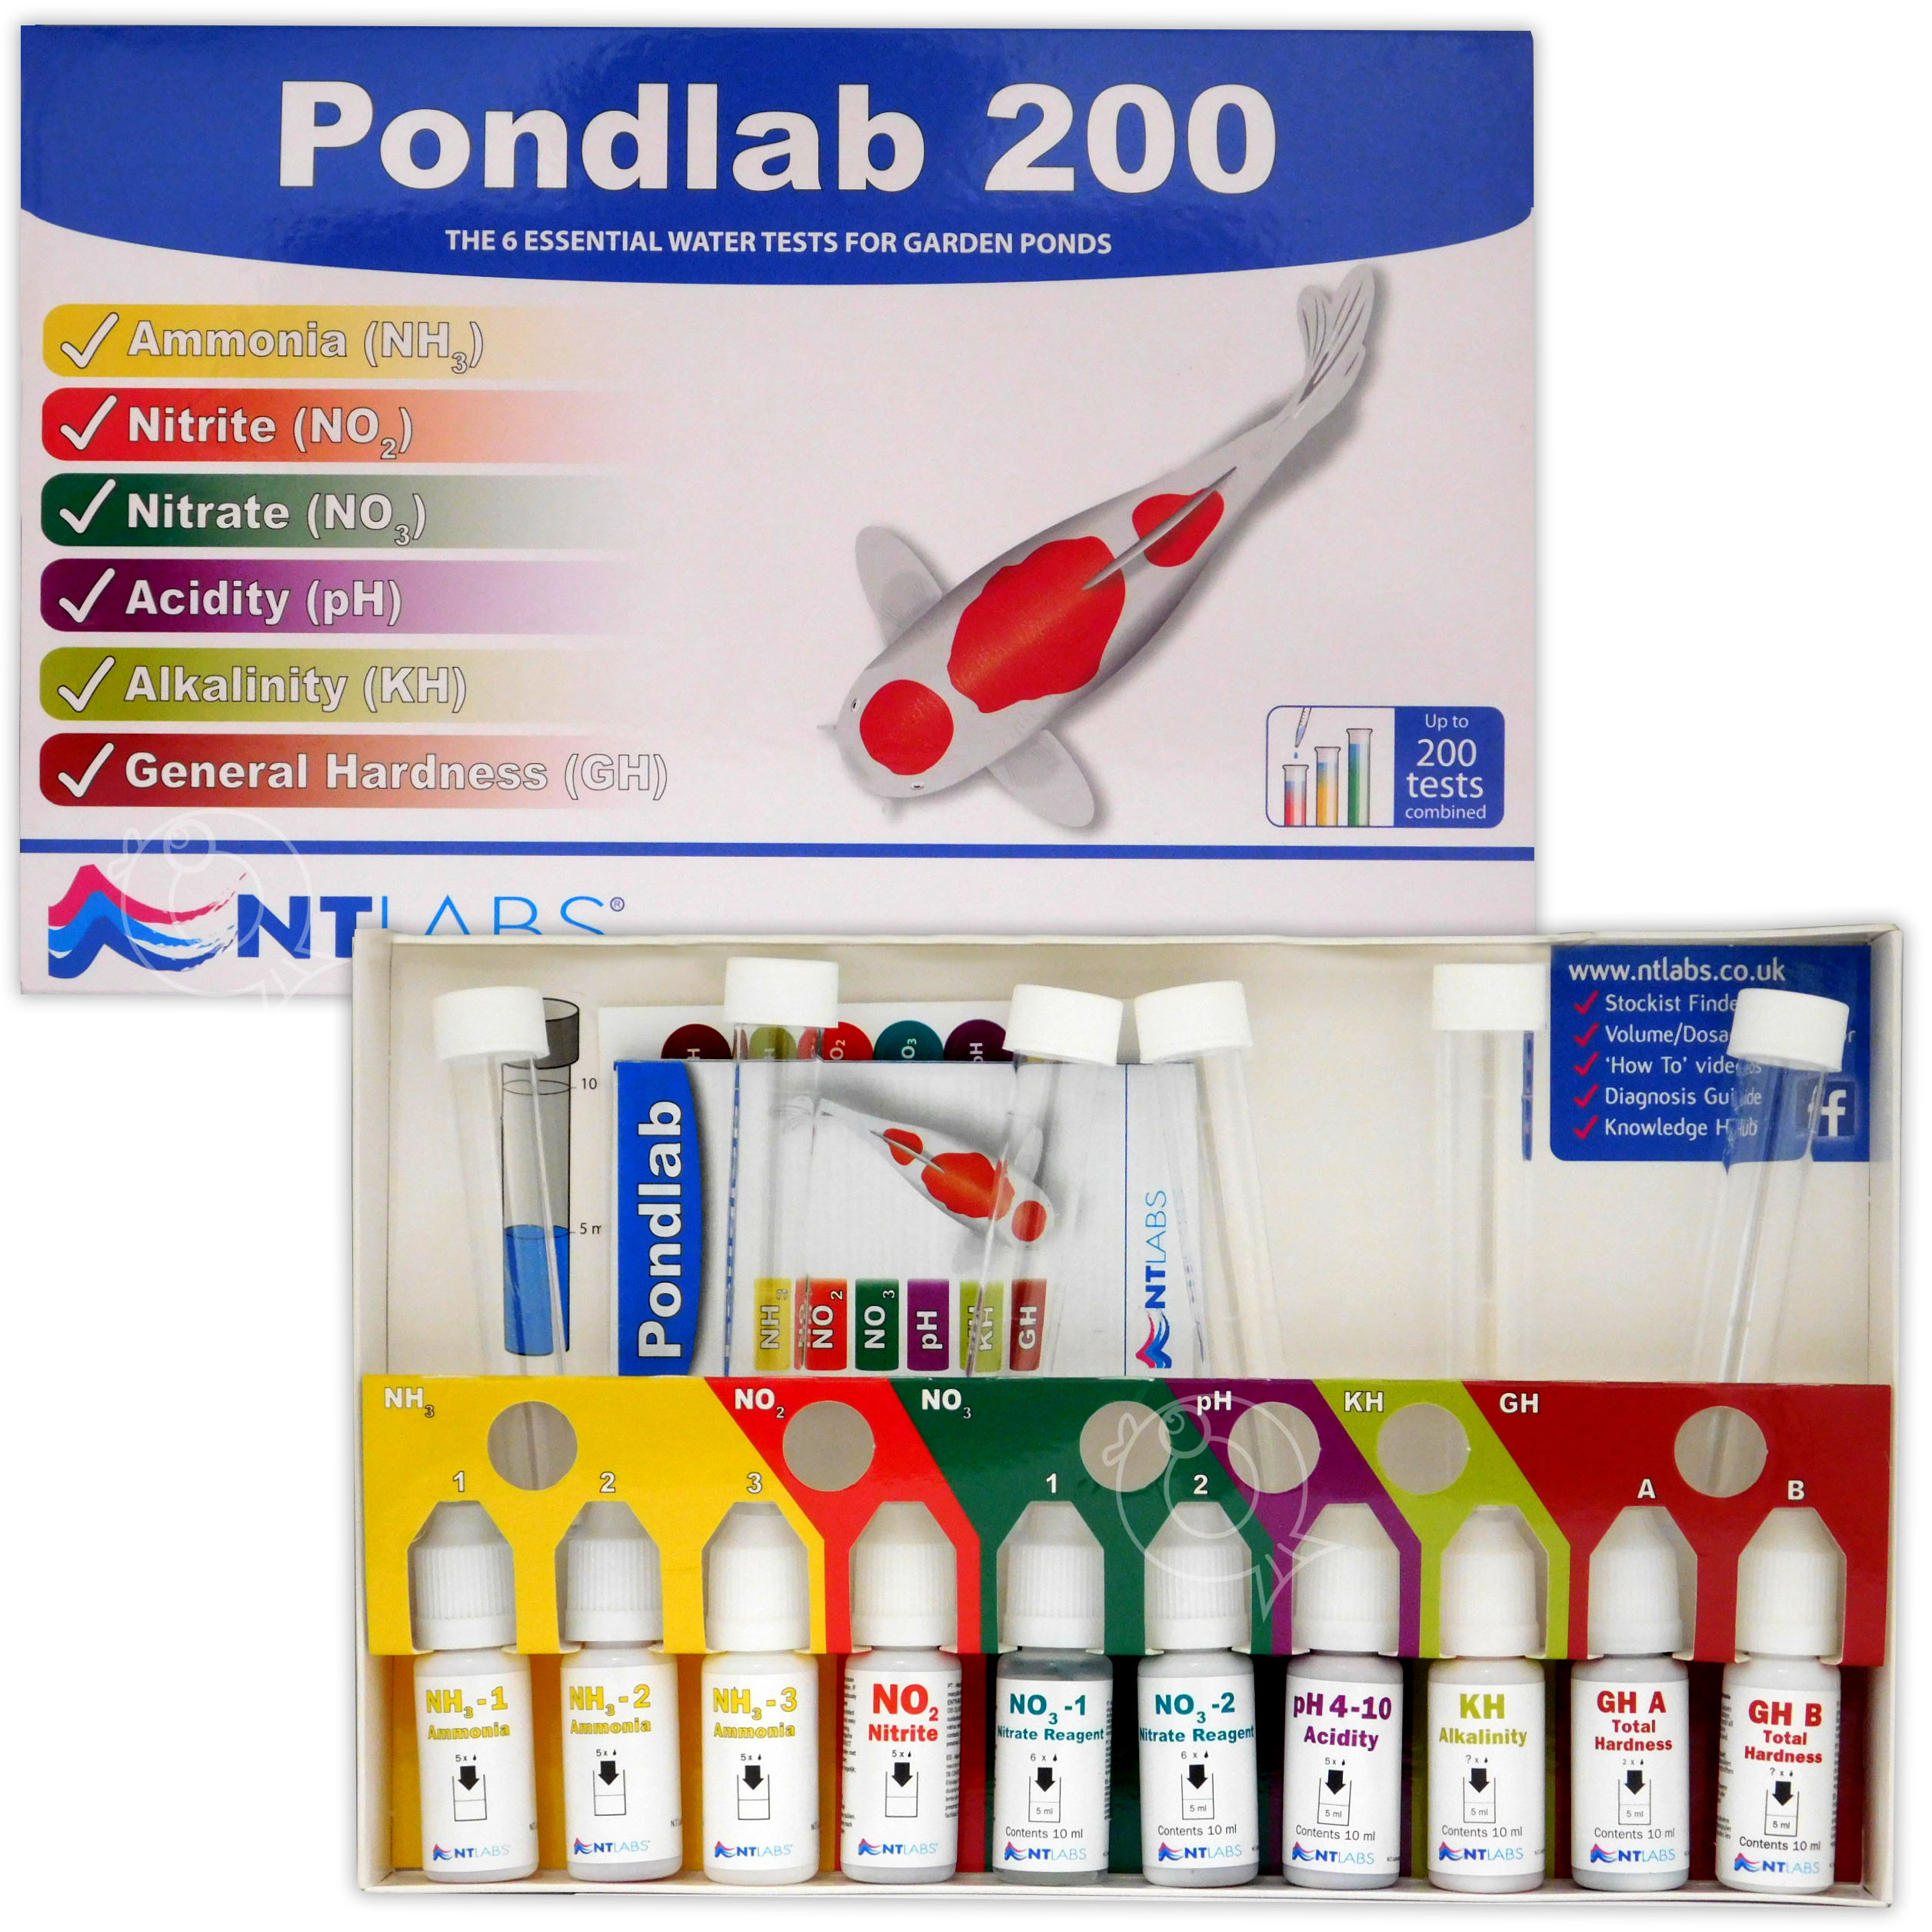 Details about NT LABS PONDLAB 200 MULTI-TEST KIT MASTER POND LAB WATER  TESTING SET PH GARDEN